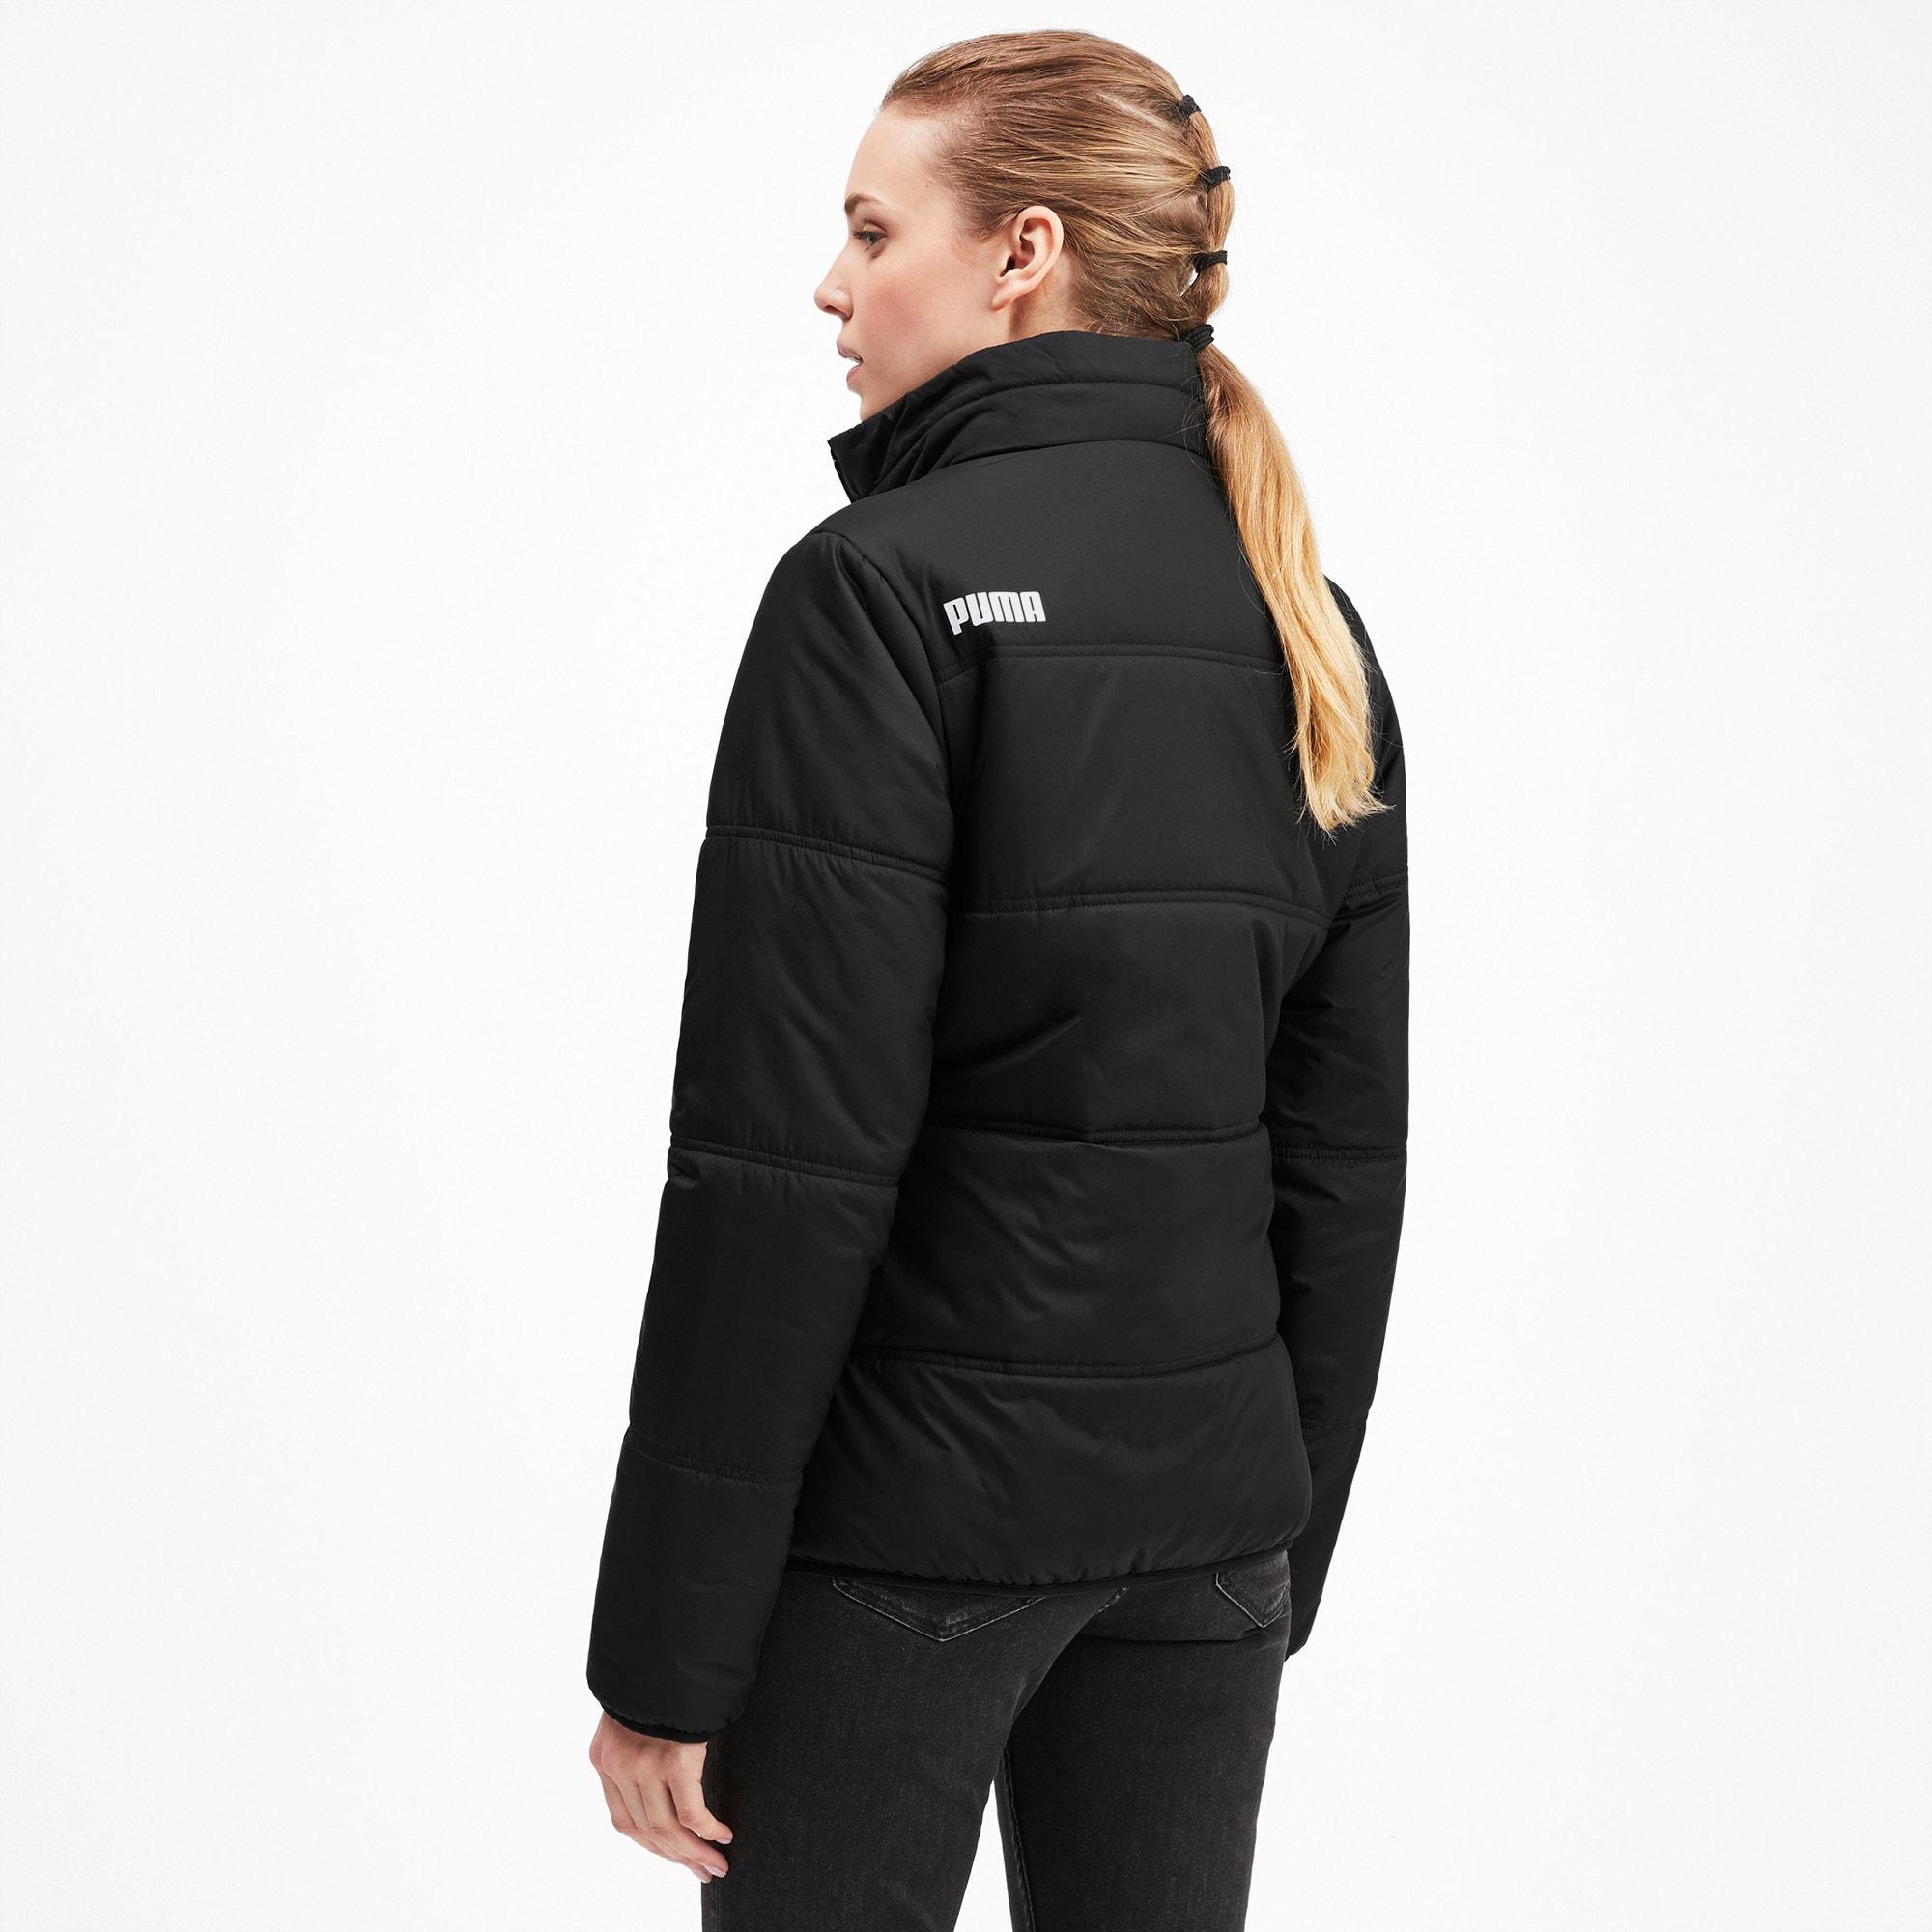 Thumbnail 2 of Essentials Padded Women's Jacket, Puma Black, medium